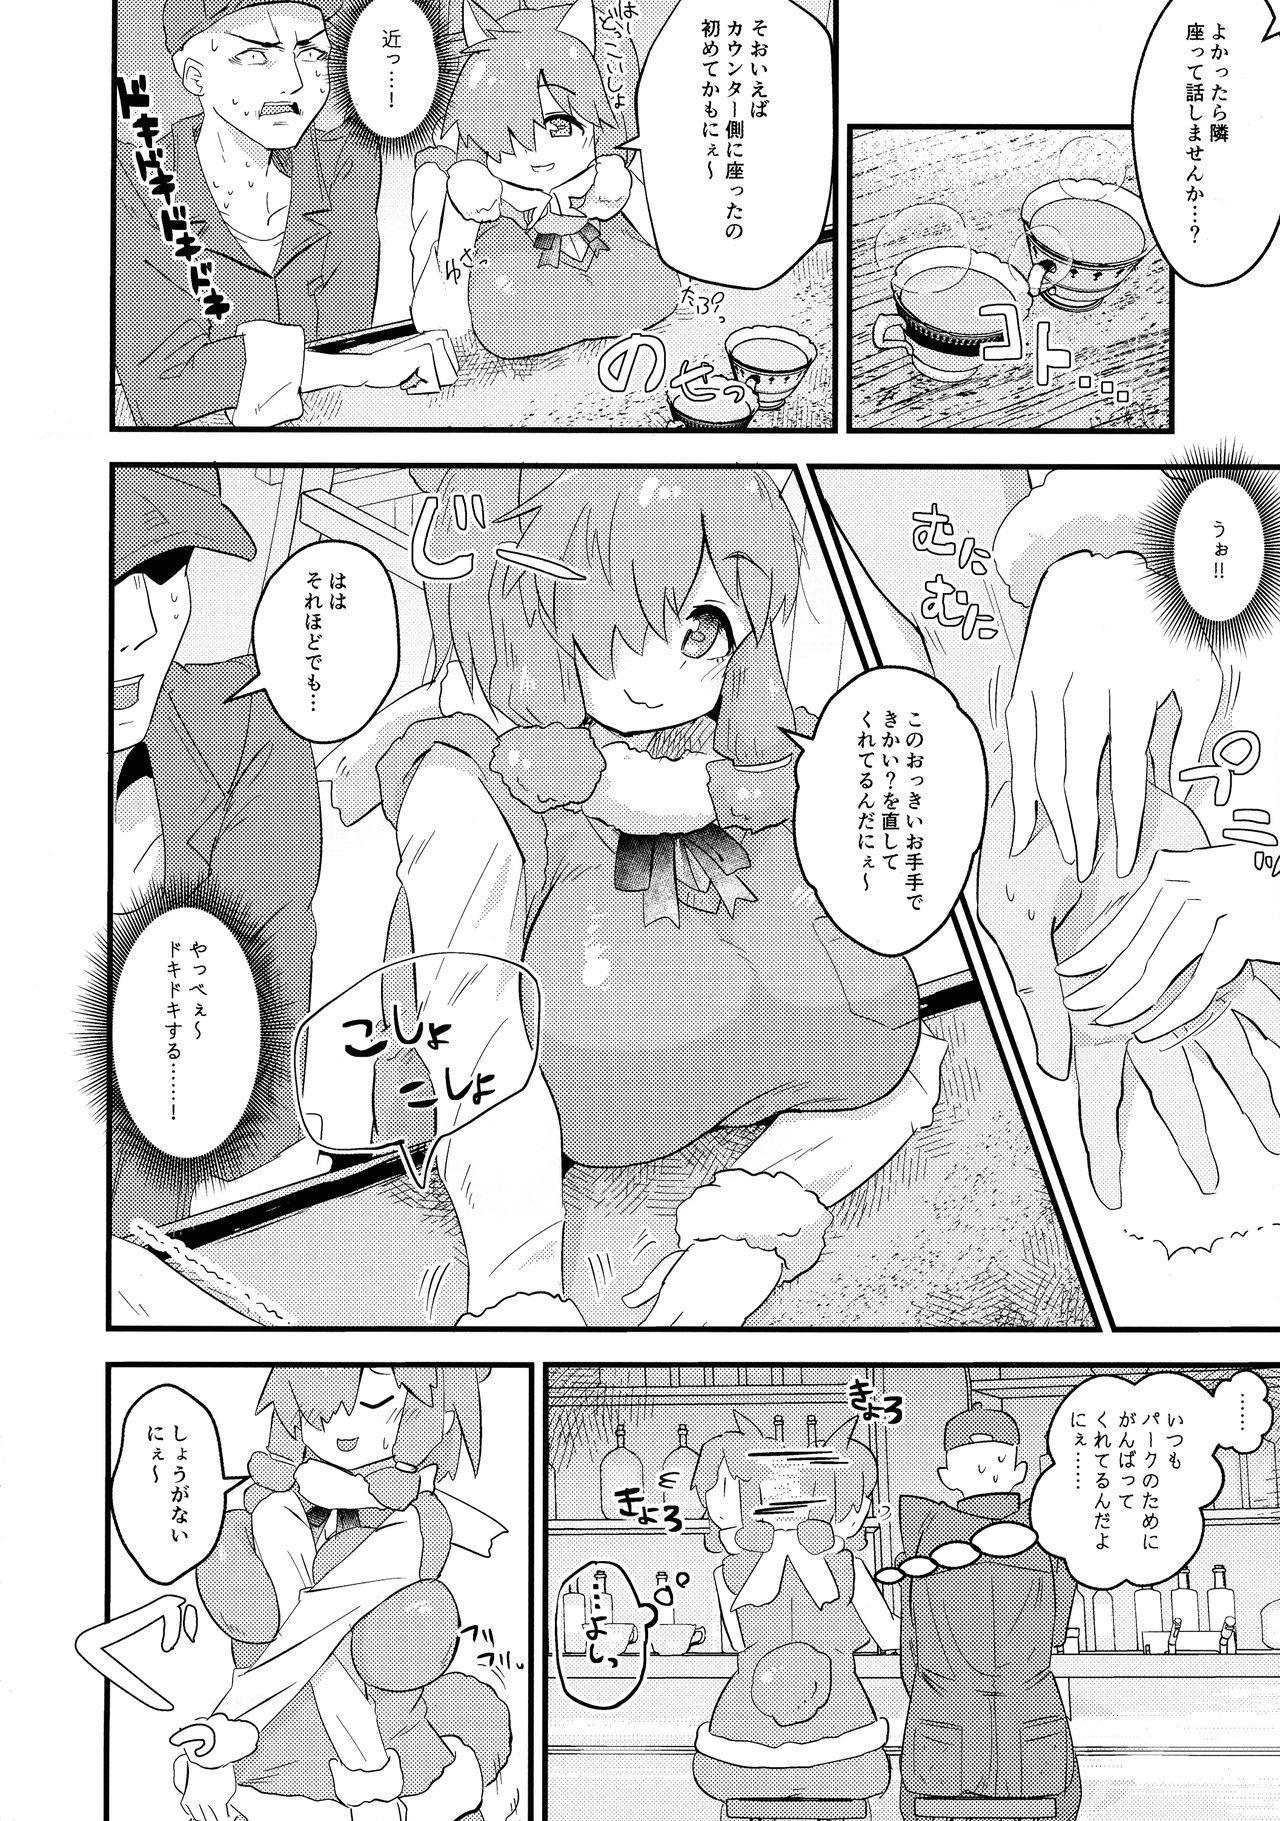 Fuwaaa! Irasshaai! Ura Iyashi no Alpaca-san Goudou 69